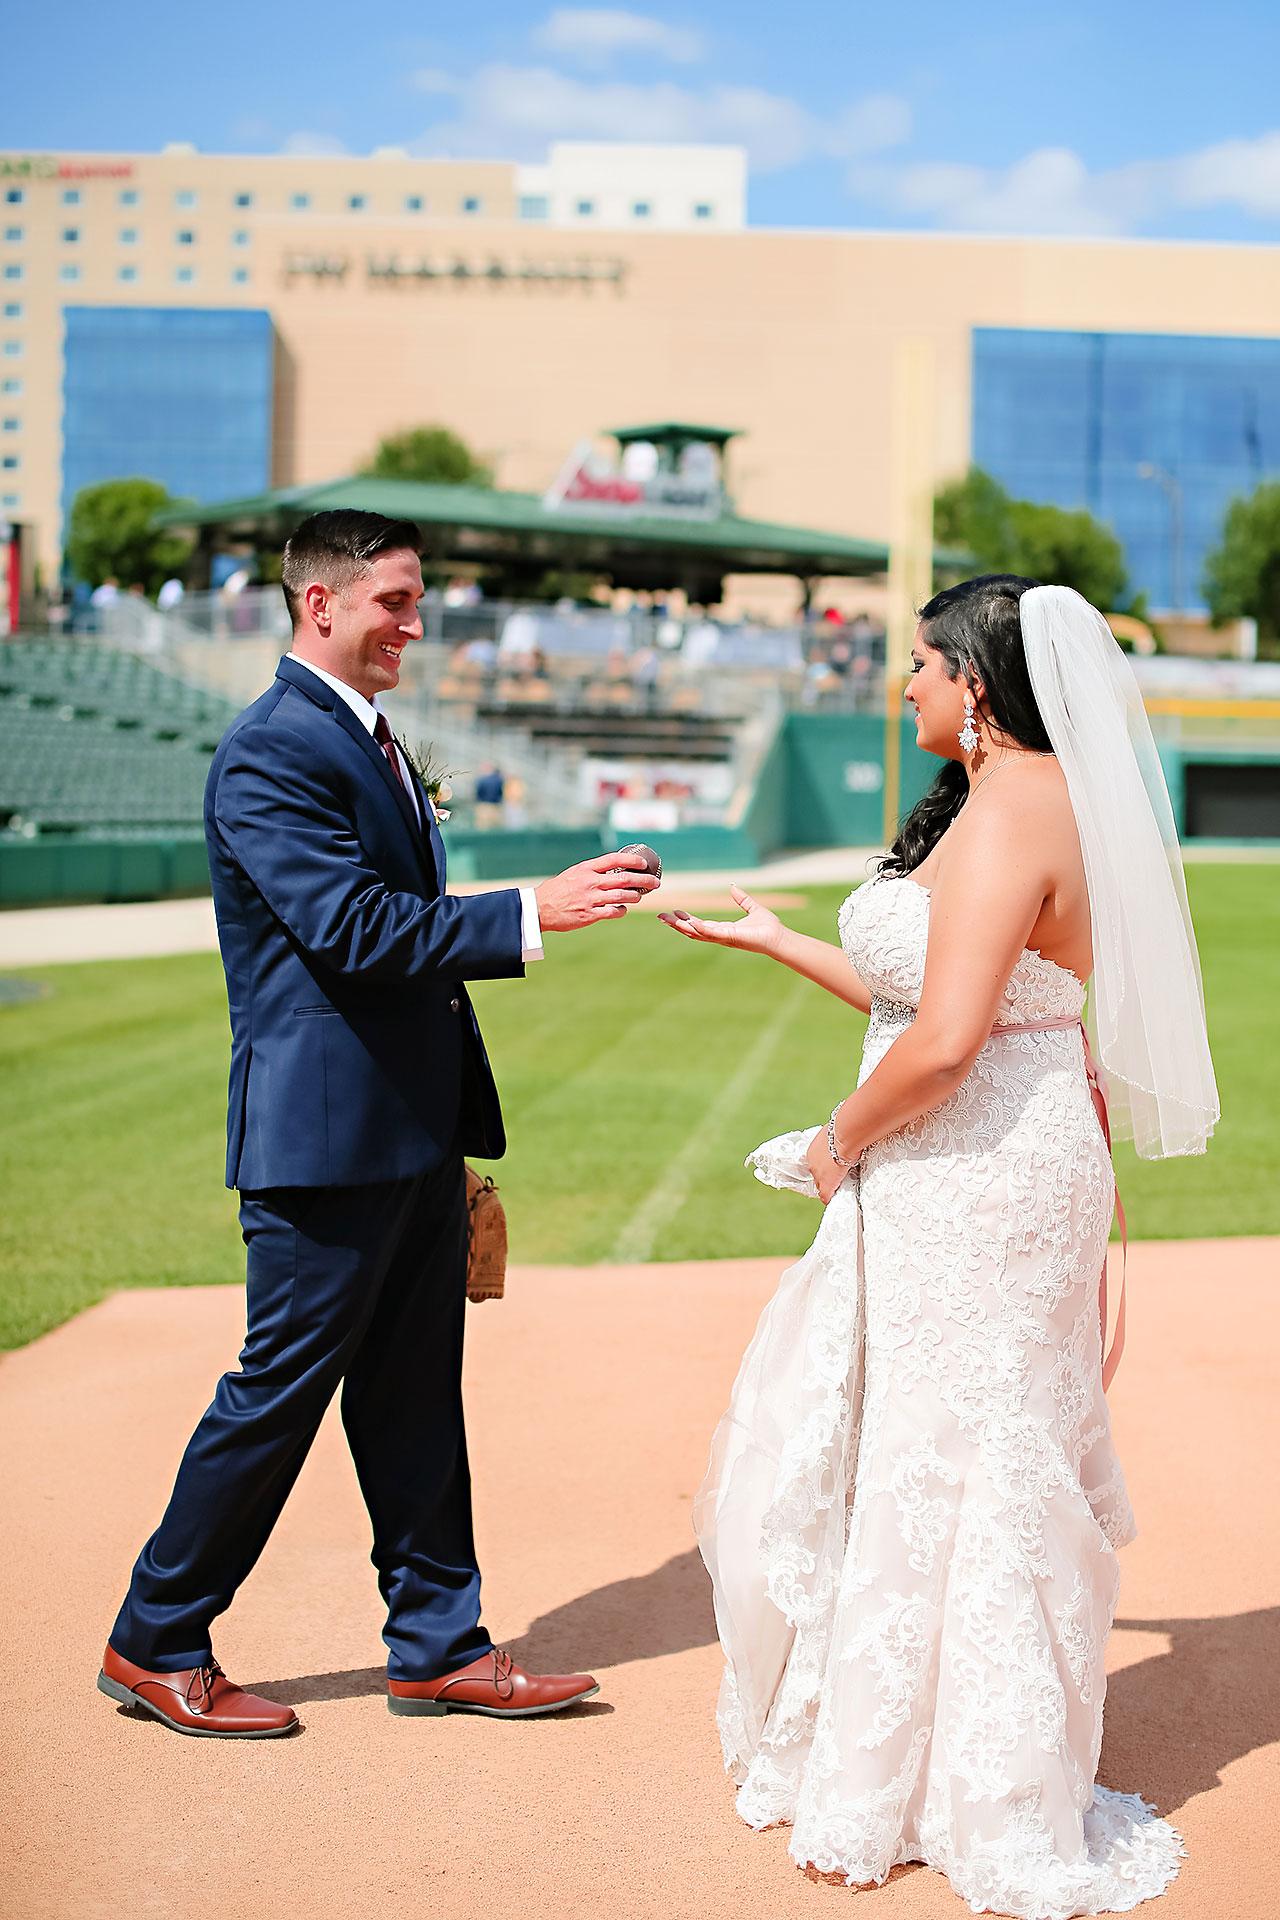 Rojita Chris St Johns Victory Field Wedding 199